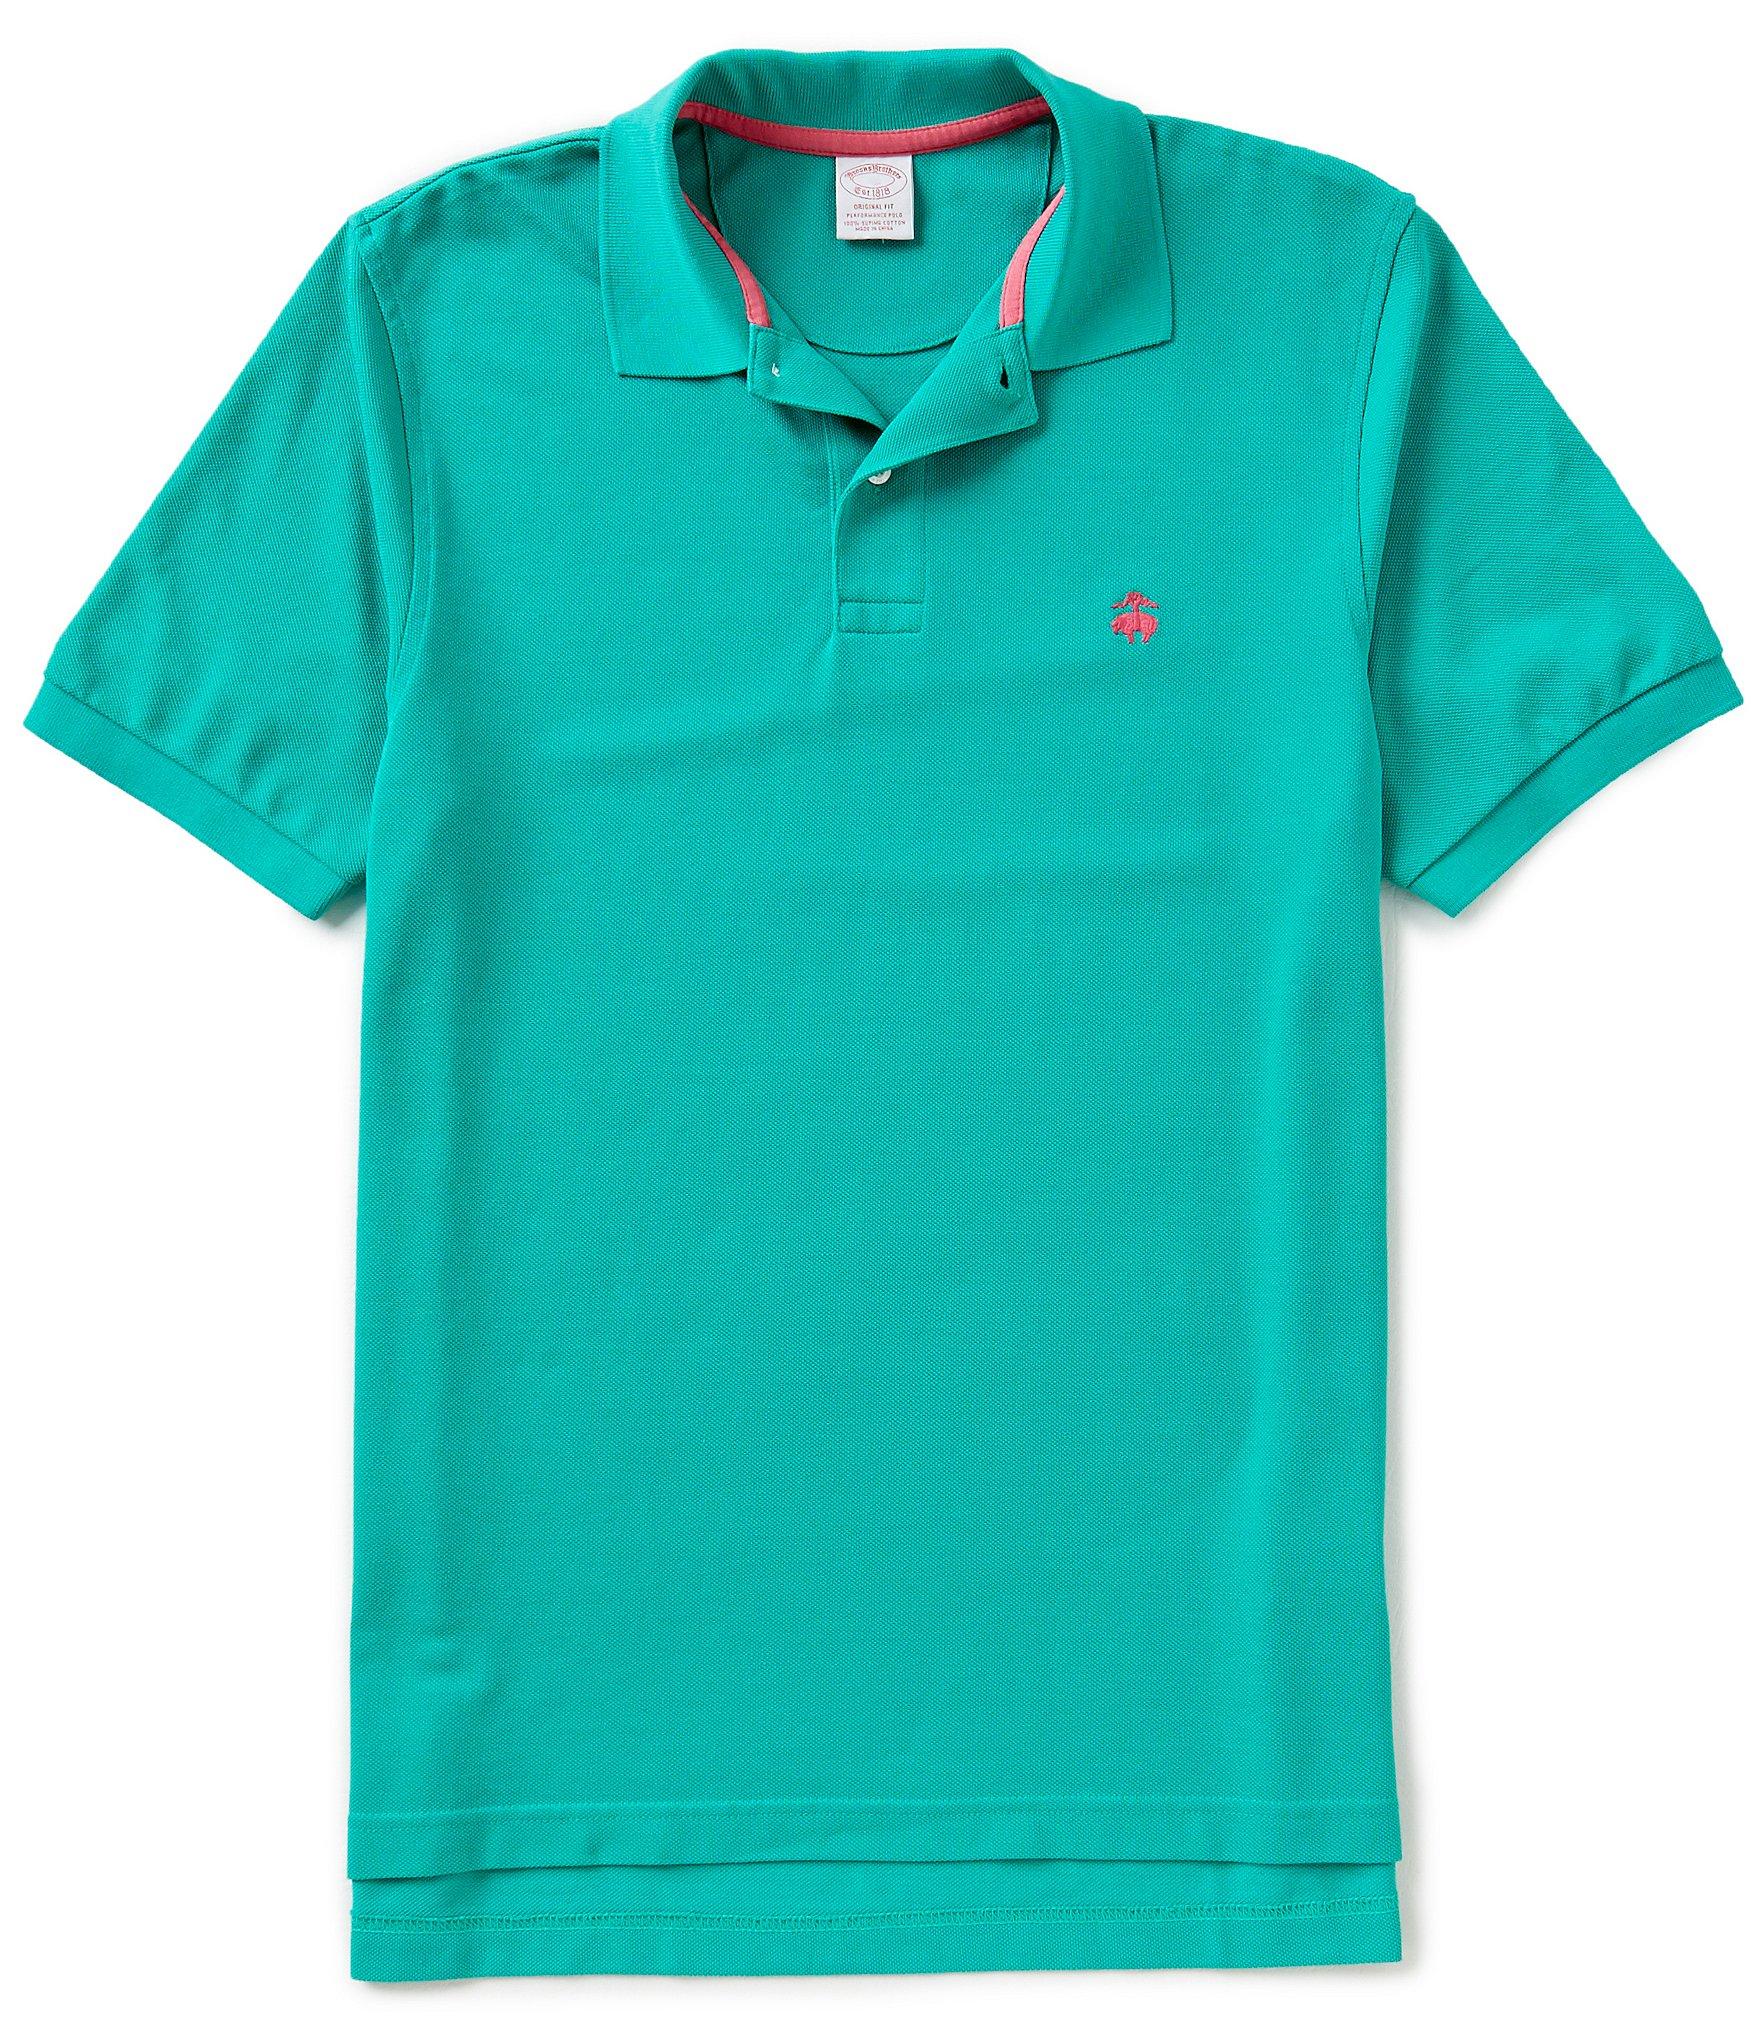 Brooks brothers golden fleece original fit supima Brooks brothers shirt size guide